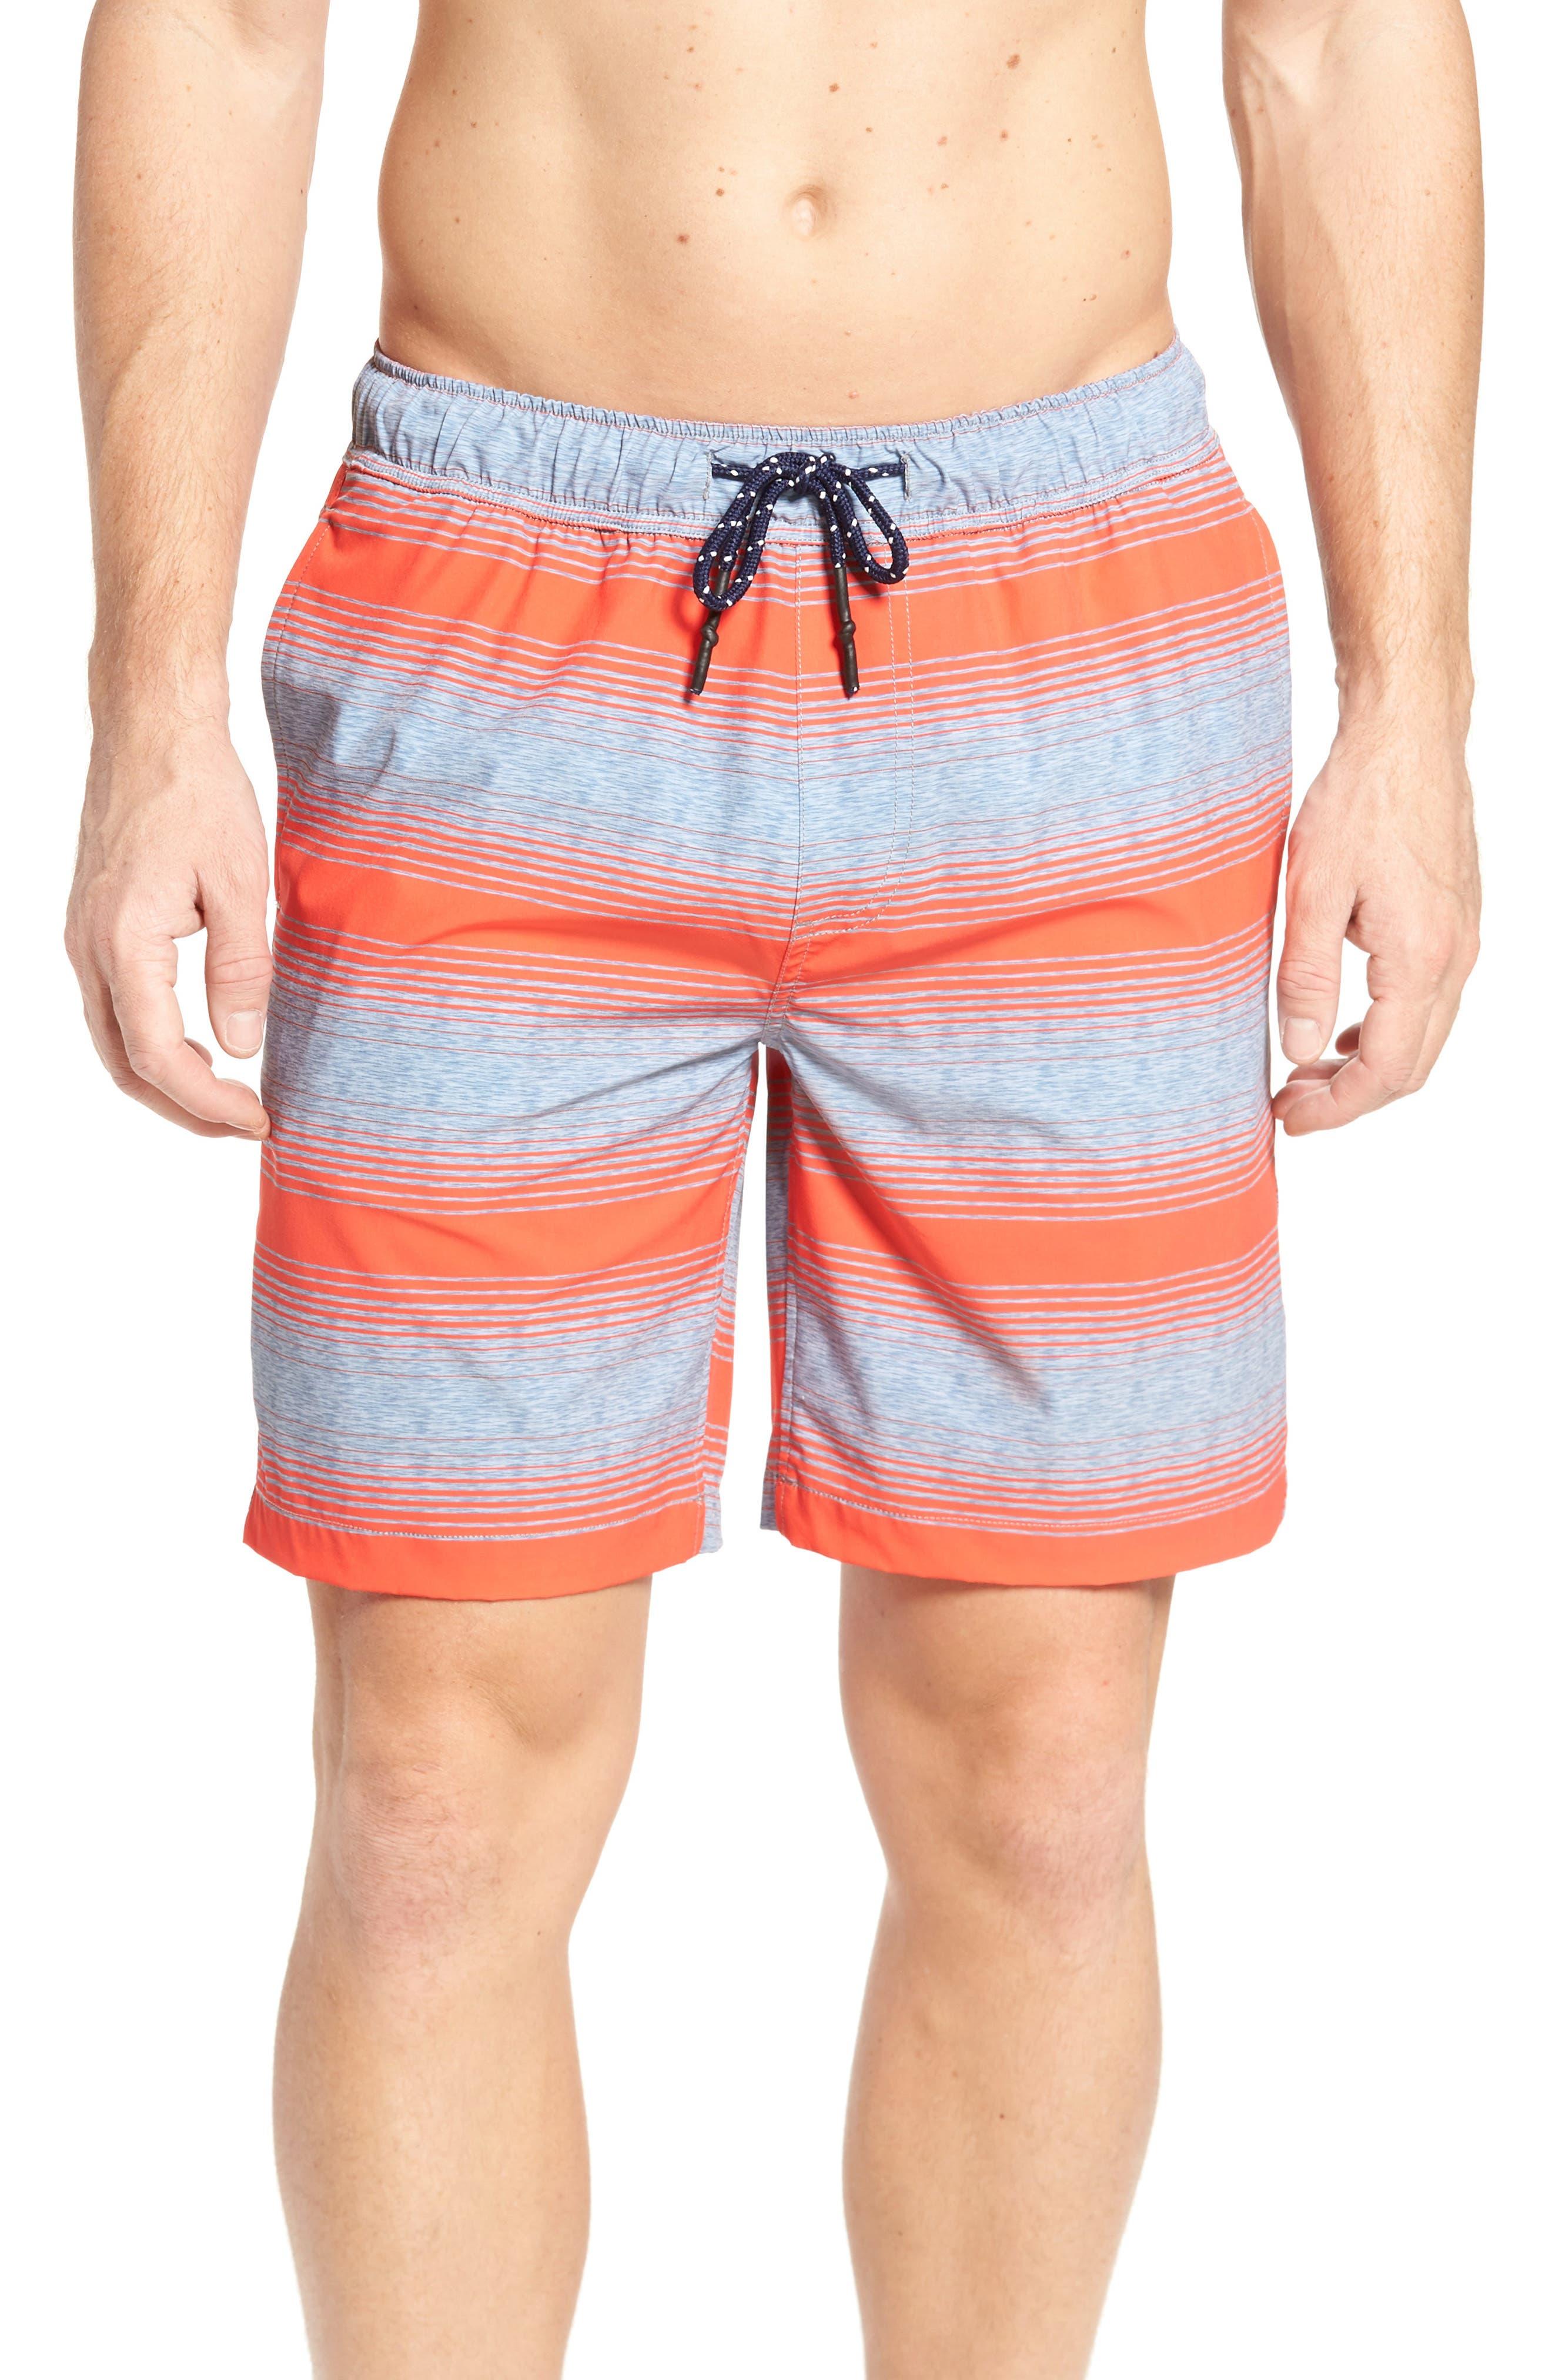 Stripe Swim Trunks,                         Main,                         color, Hot Coral